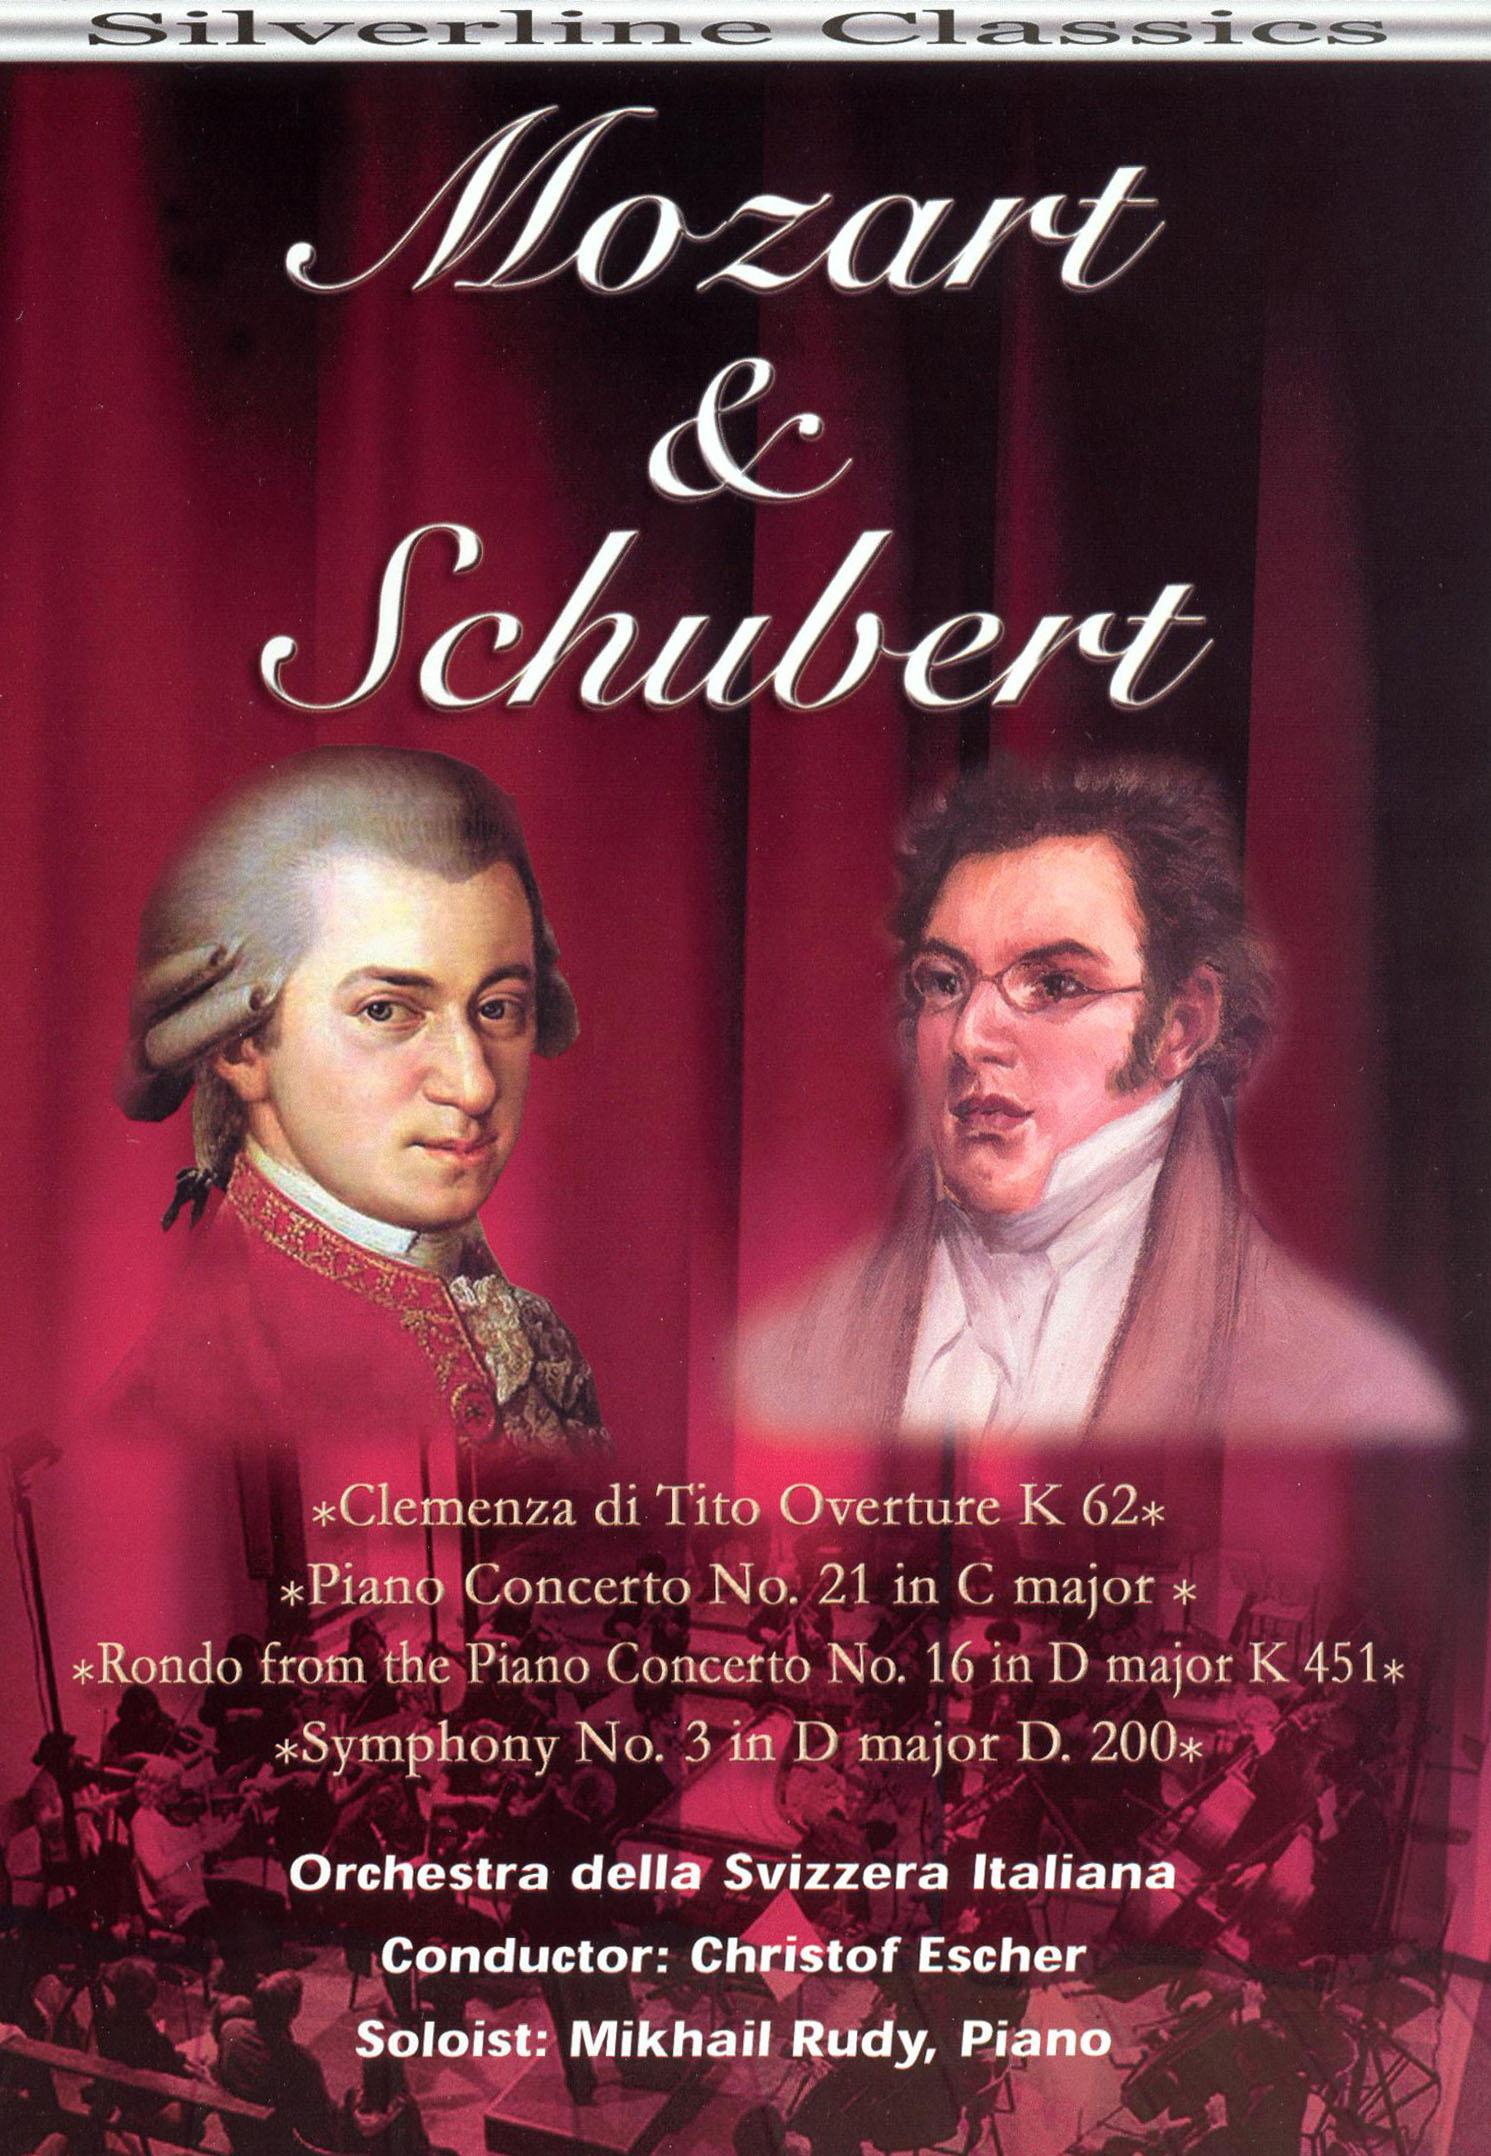 Orchestra della Svizzera Italiana: Mozart & Schubert